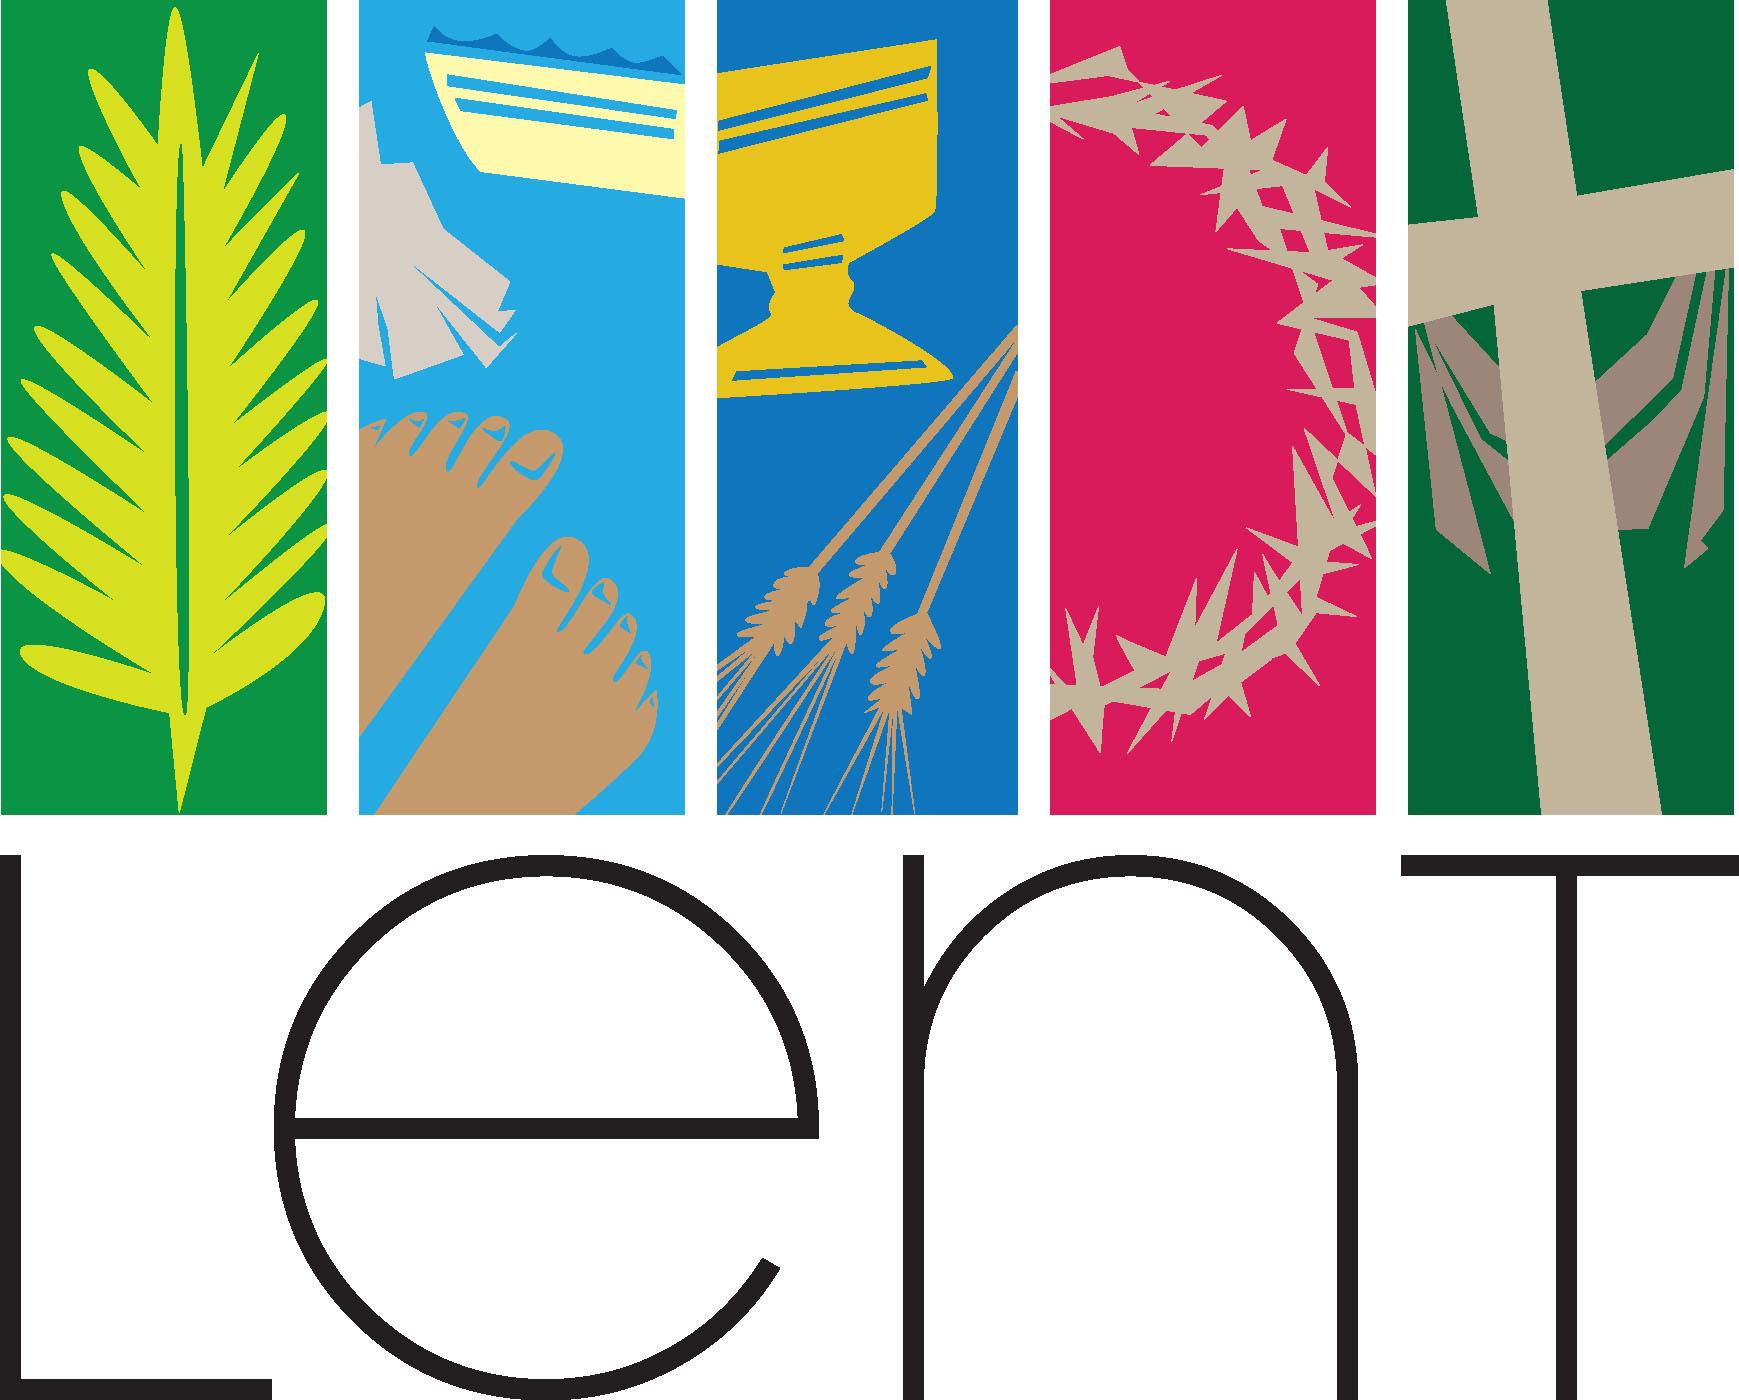 Free Lenten Clipart, Download Free Clip Art, Free Clip Art.